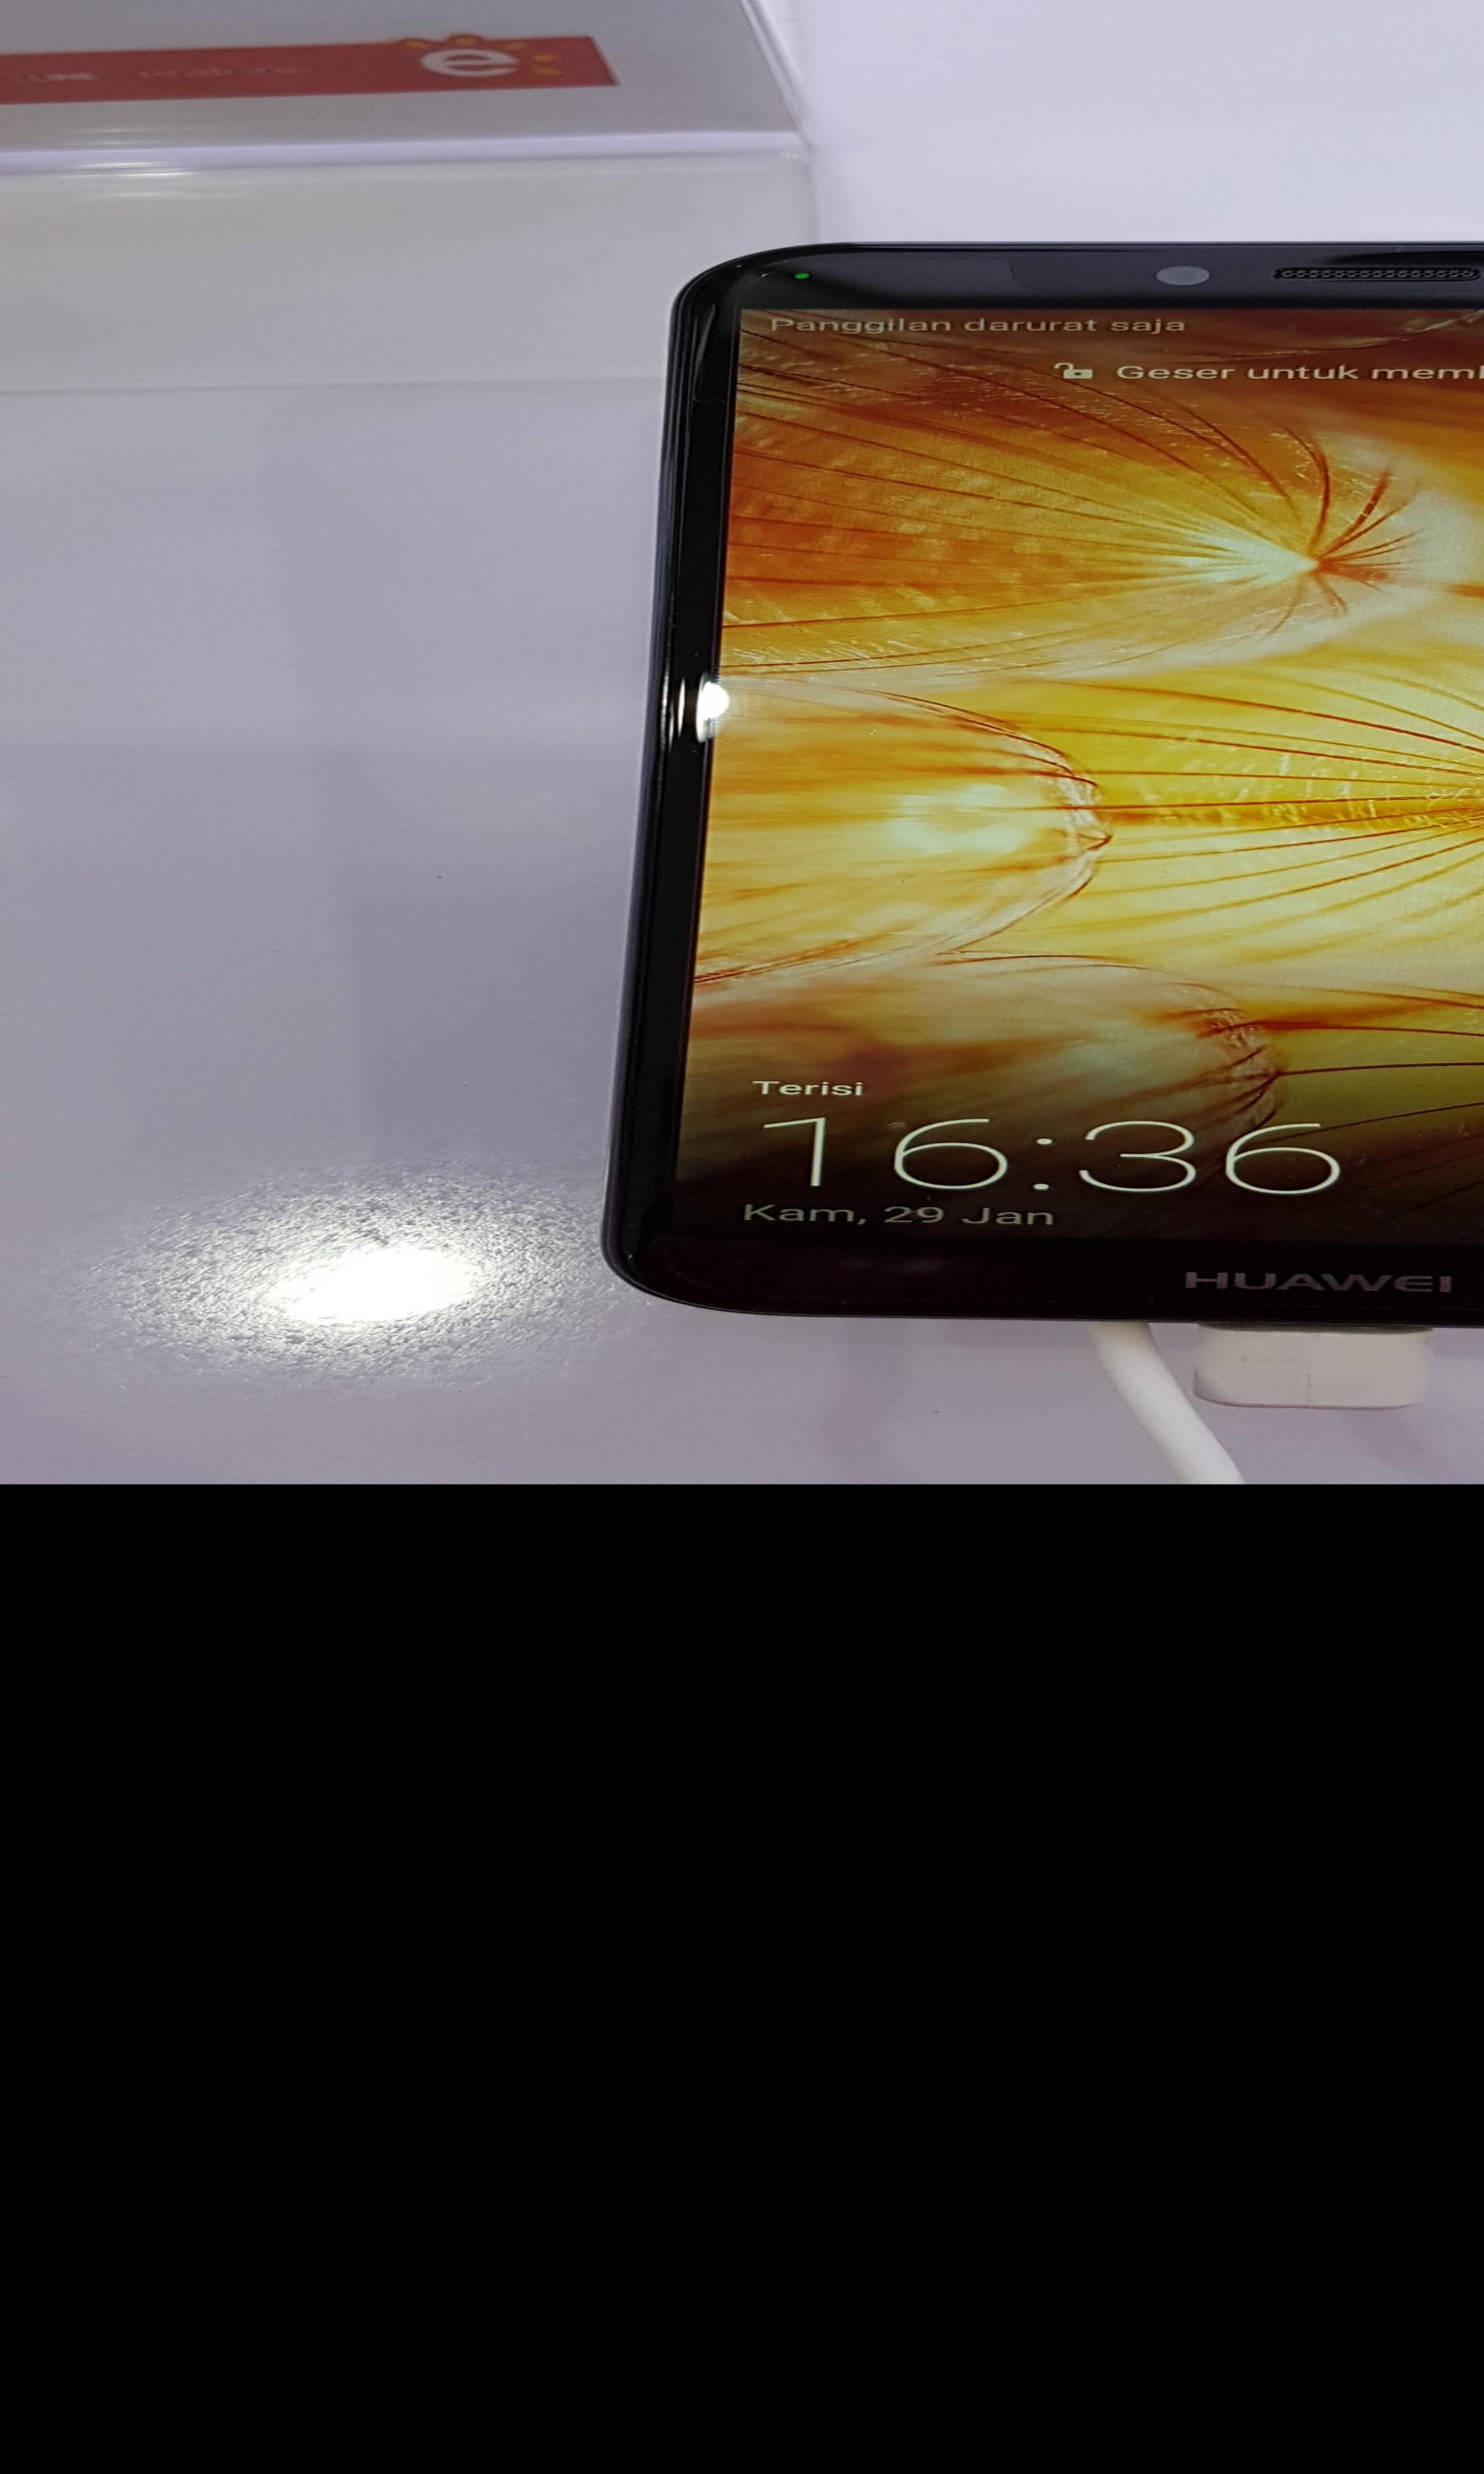 Terbaru Huawei Y6 2018 Bisa Di Cicil Gratis 1x Cicilan Serba Serbi